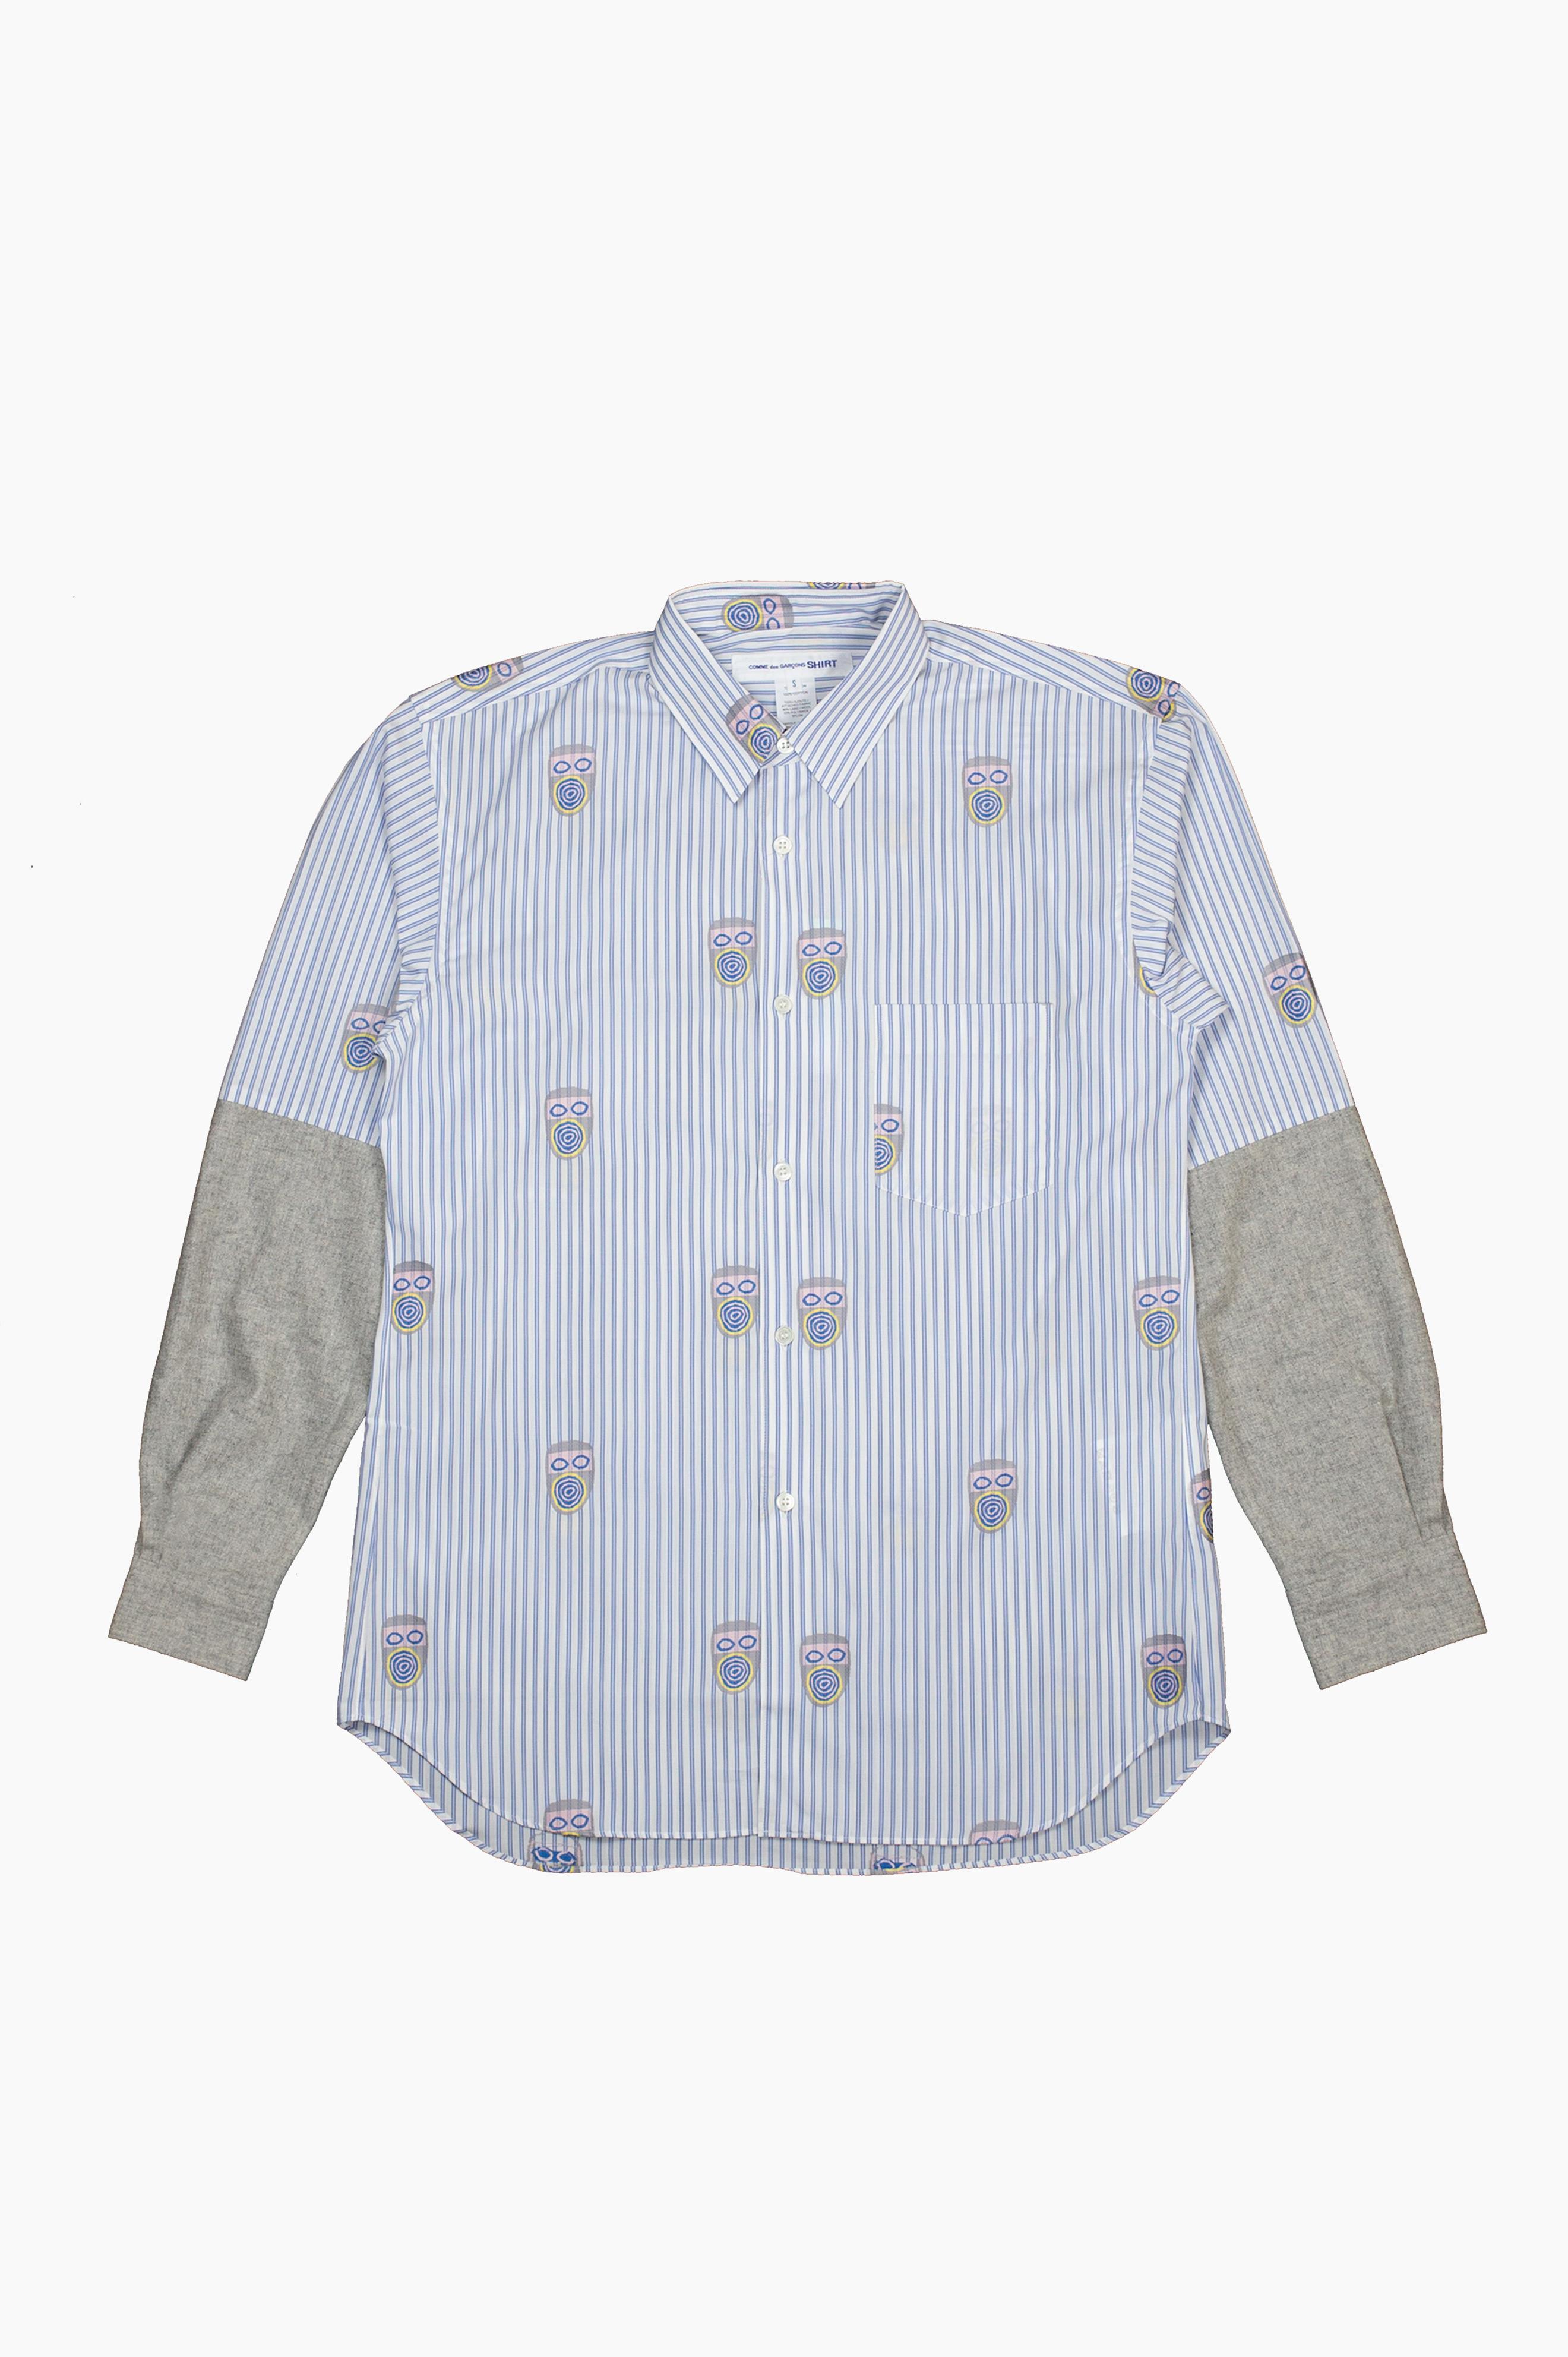 Stripes Mask Shirt White/Blue